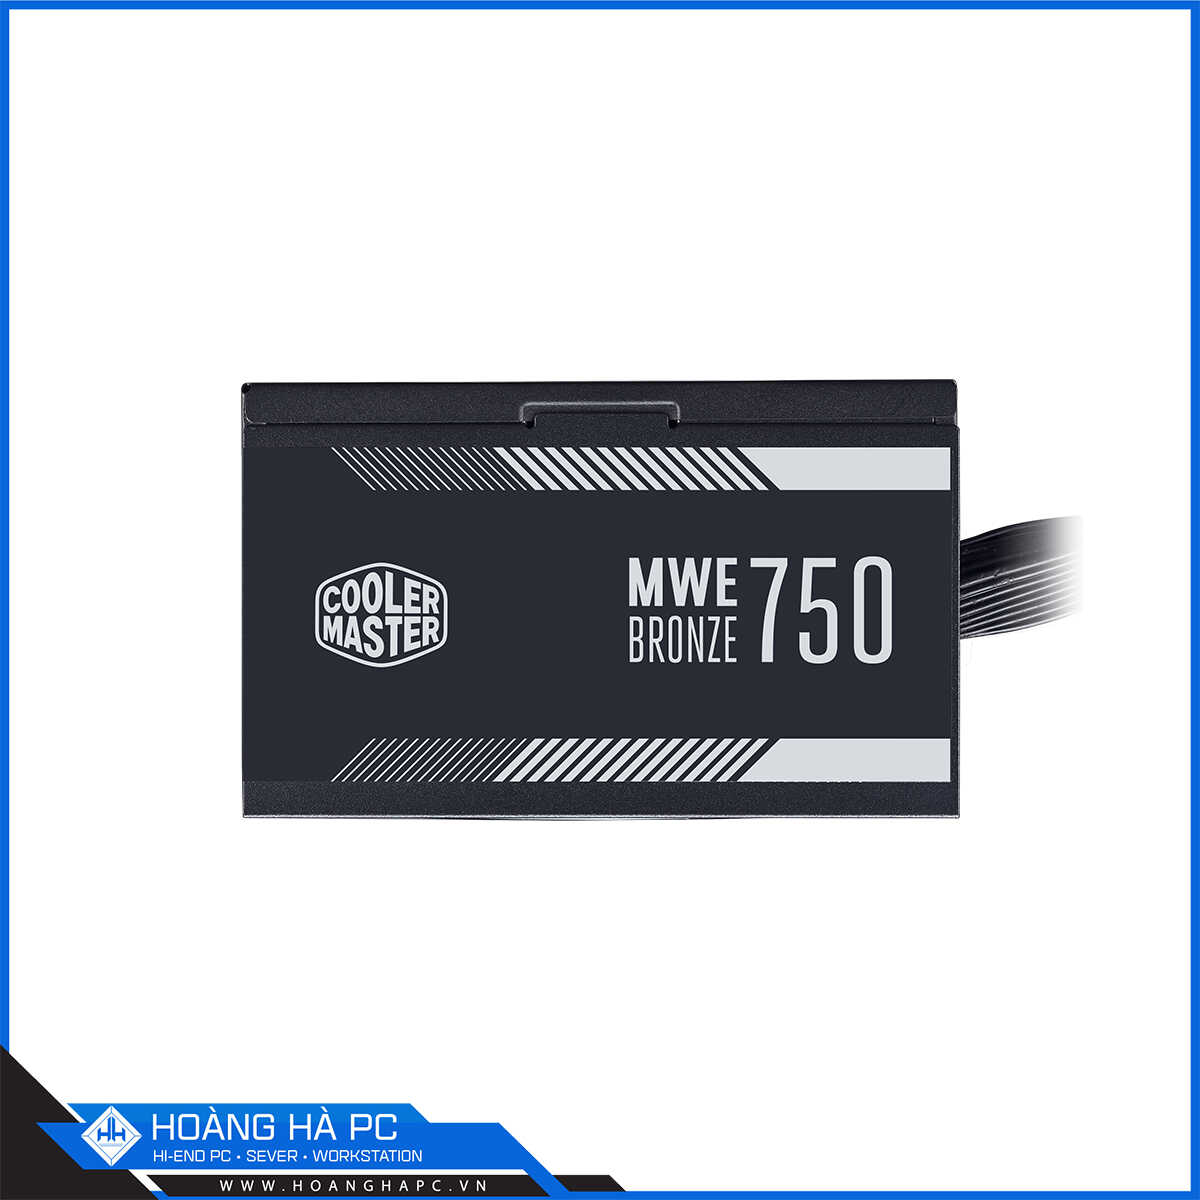 Nguồn Cooler Master MWE BRONZE 750 V2 - 750W